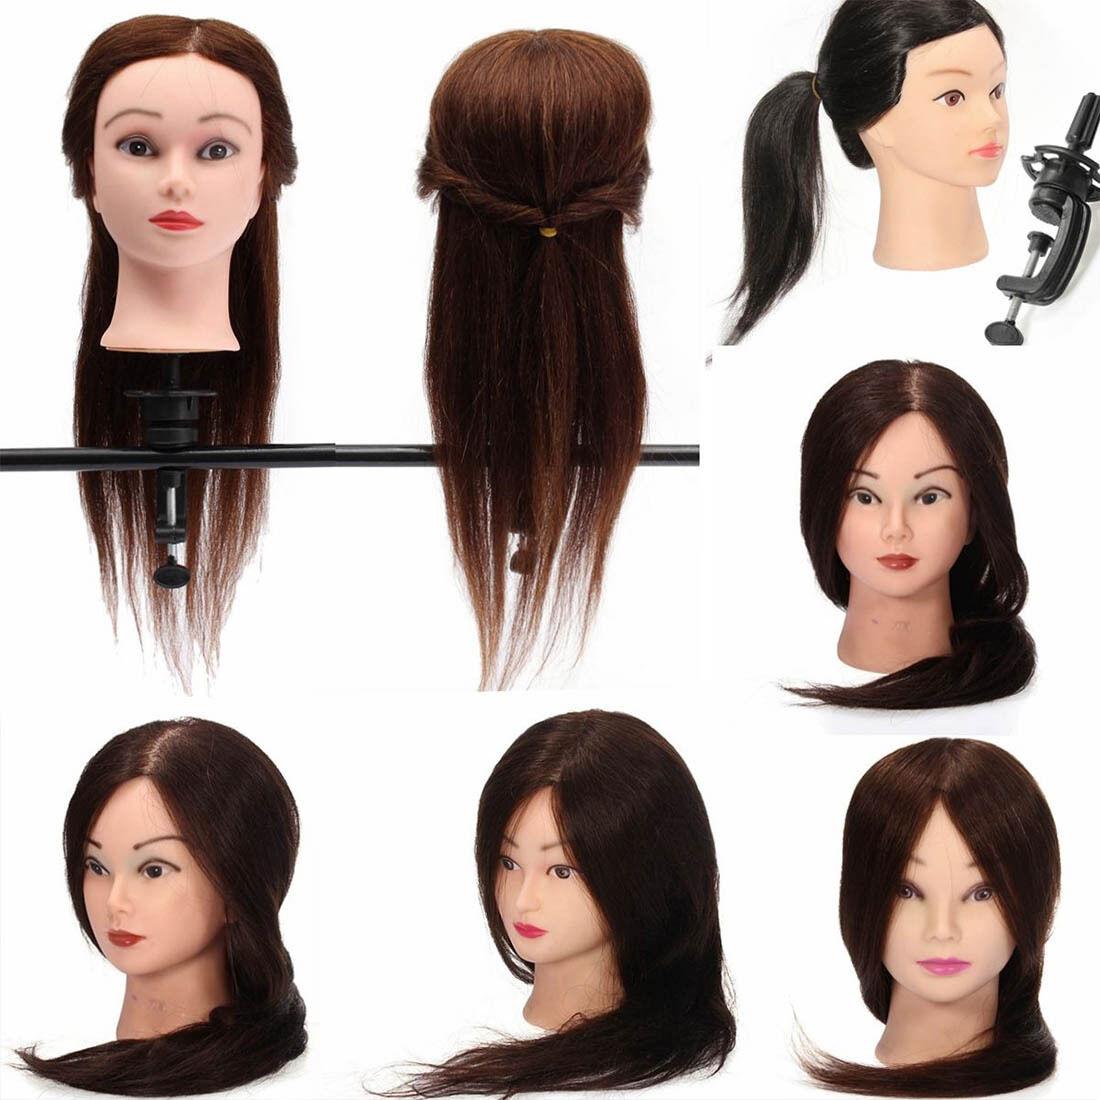 "Hair 24"" Salon Hairdressing Practice Training Head Manneq..."